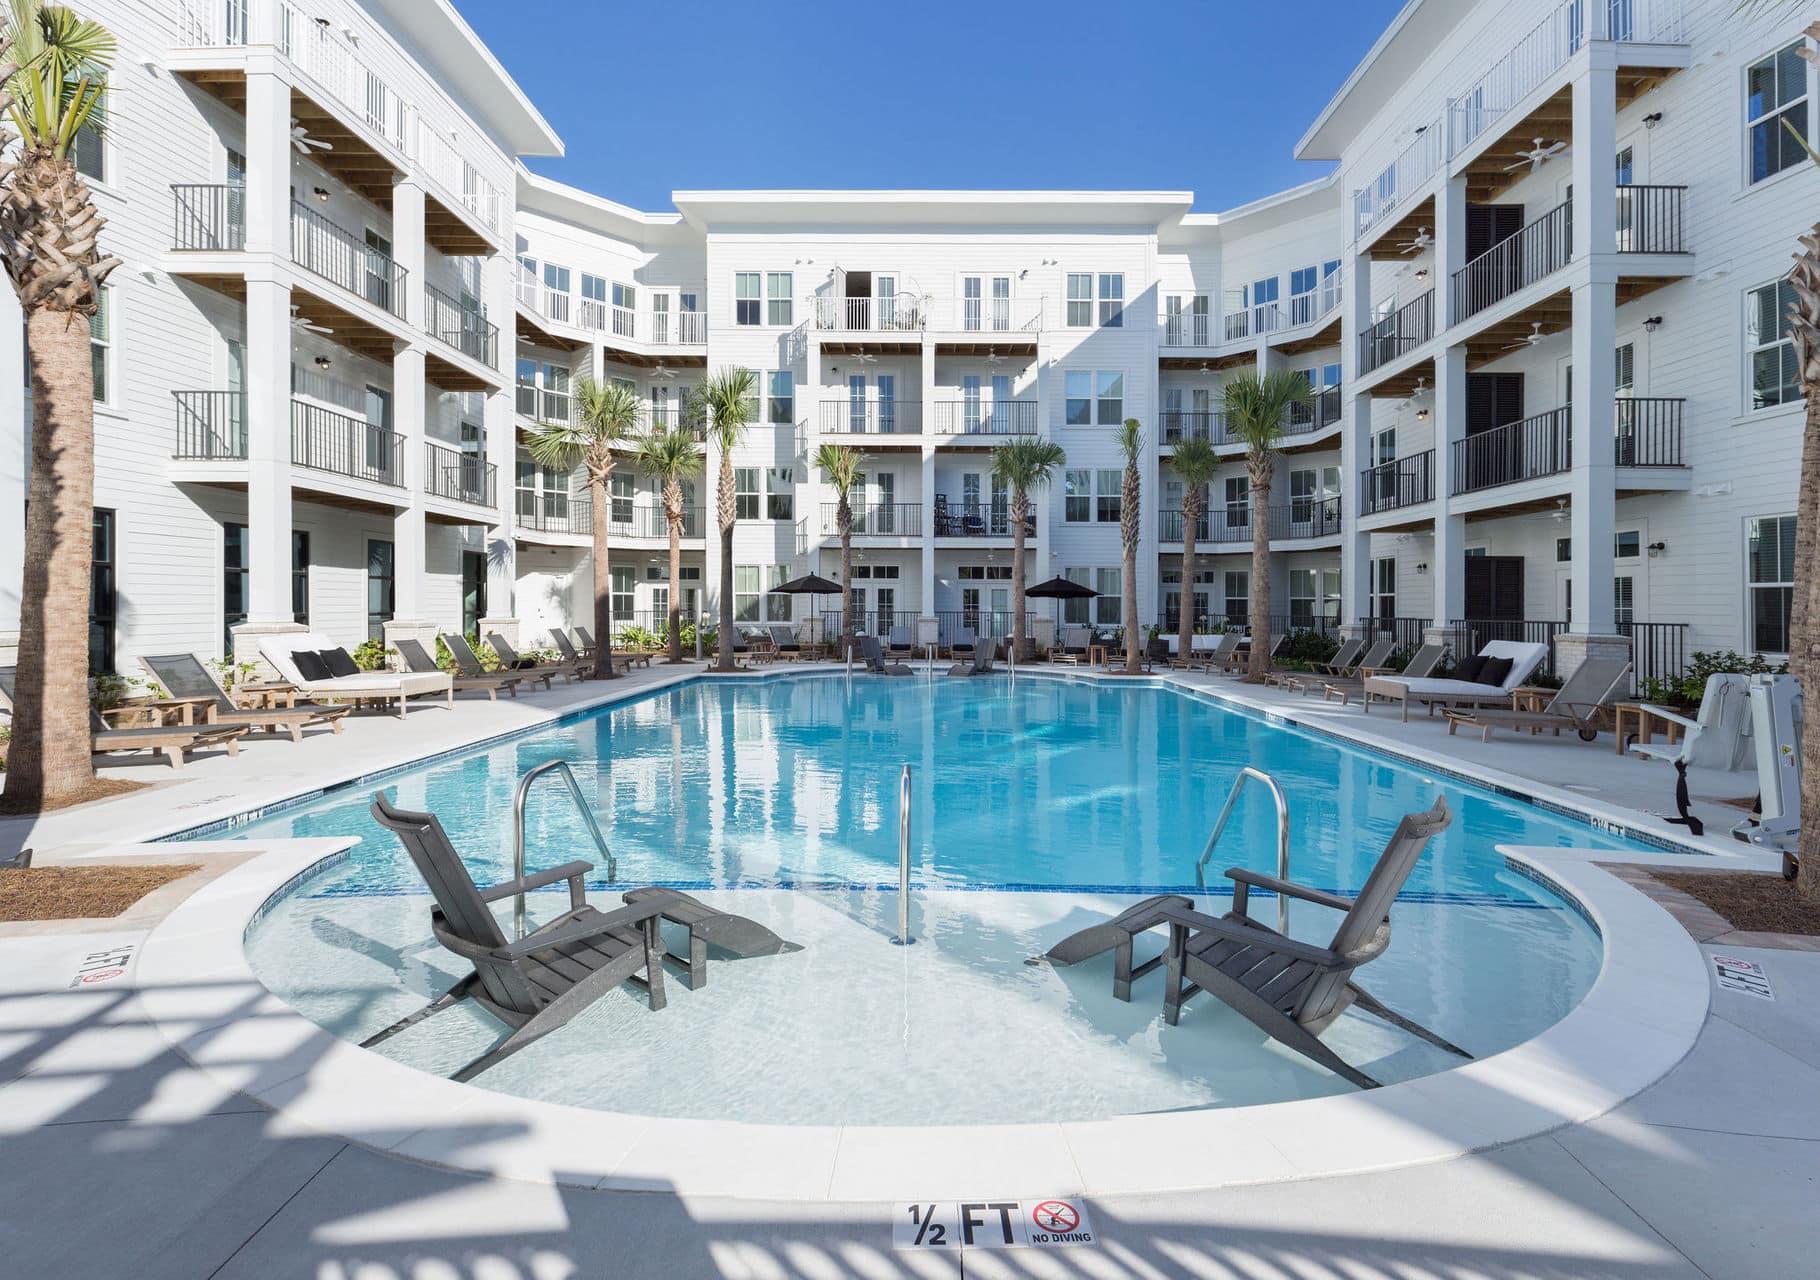 apartment complex new pool